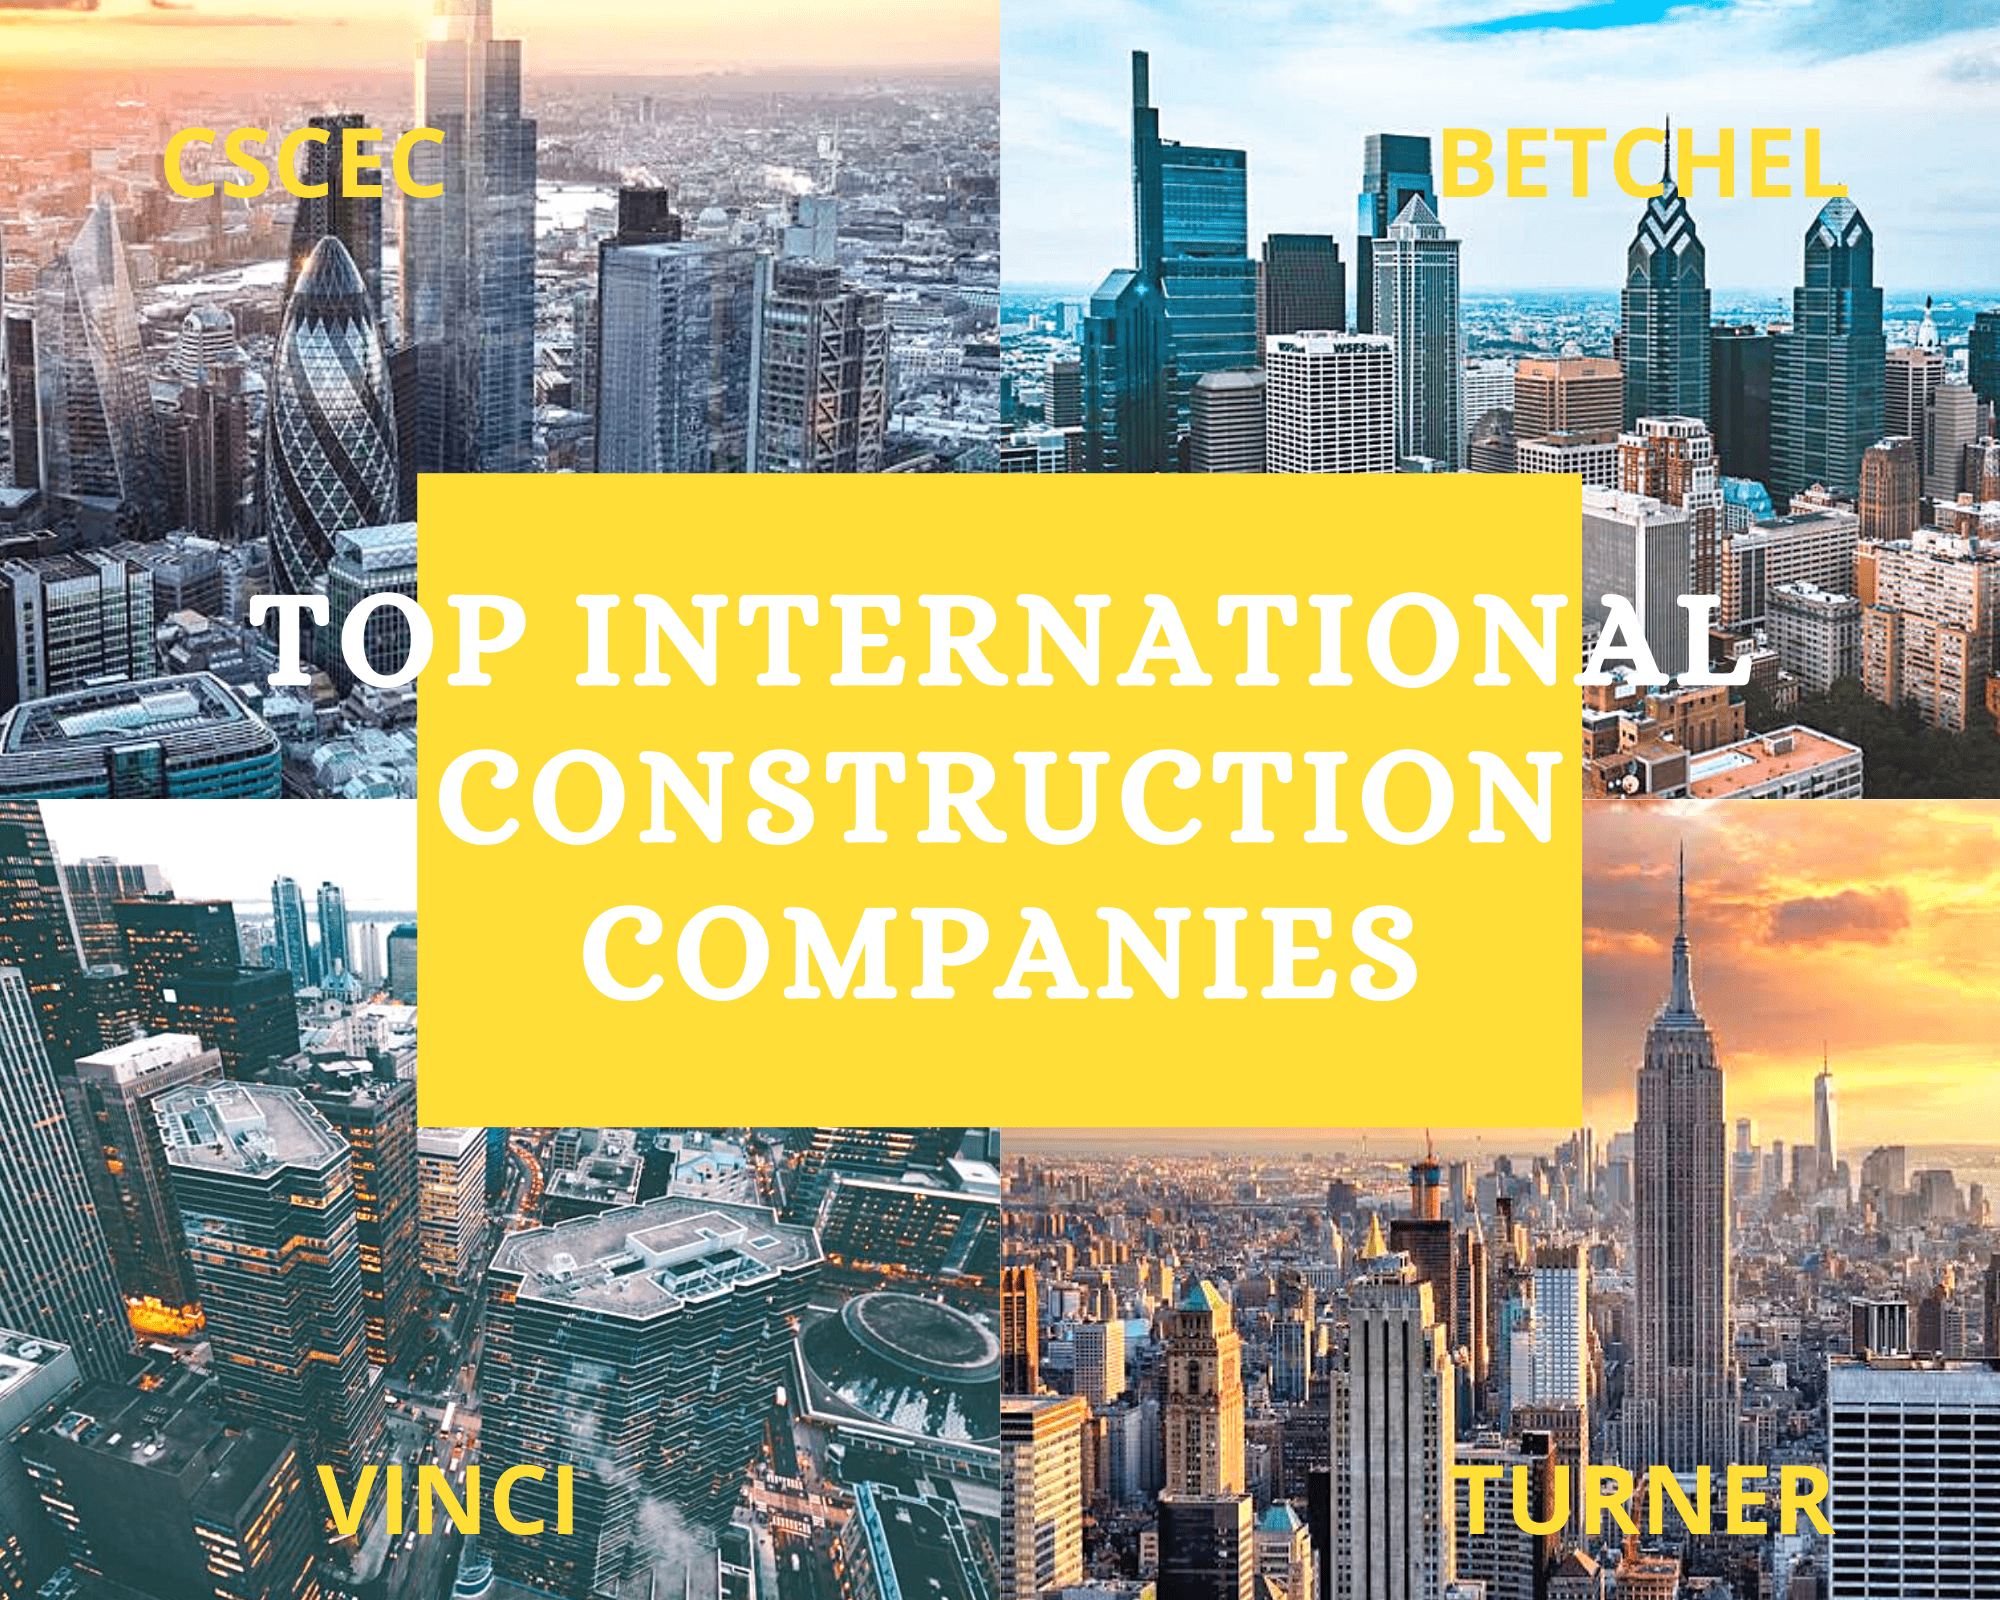 Top international construction companies